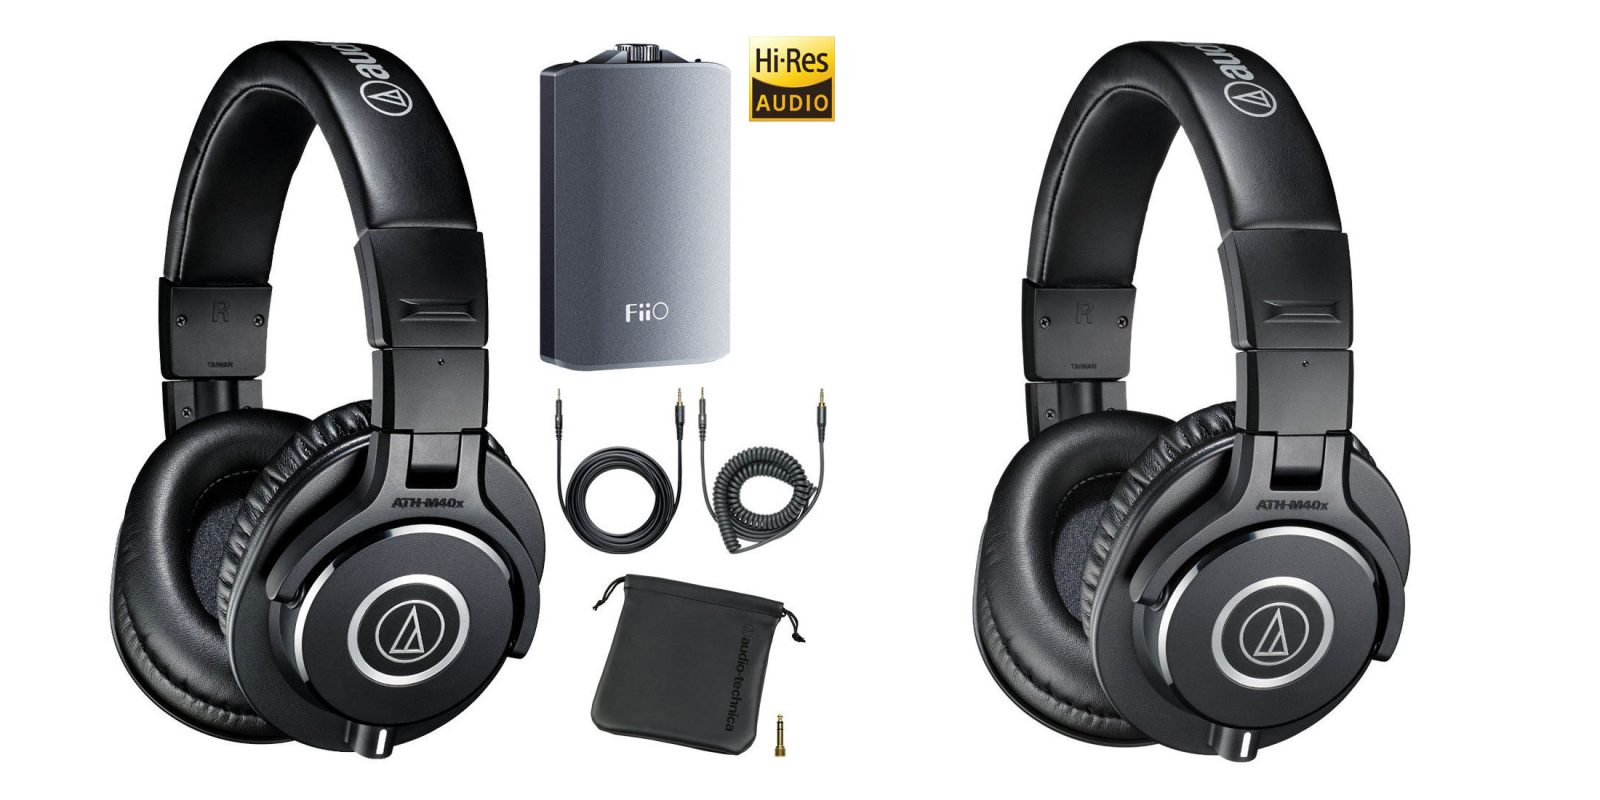 0431b4c945d Audio-Technica Headphone Deals from $59: ATH-M40x + FiiO A3, ATH-M30x, more